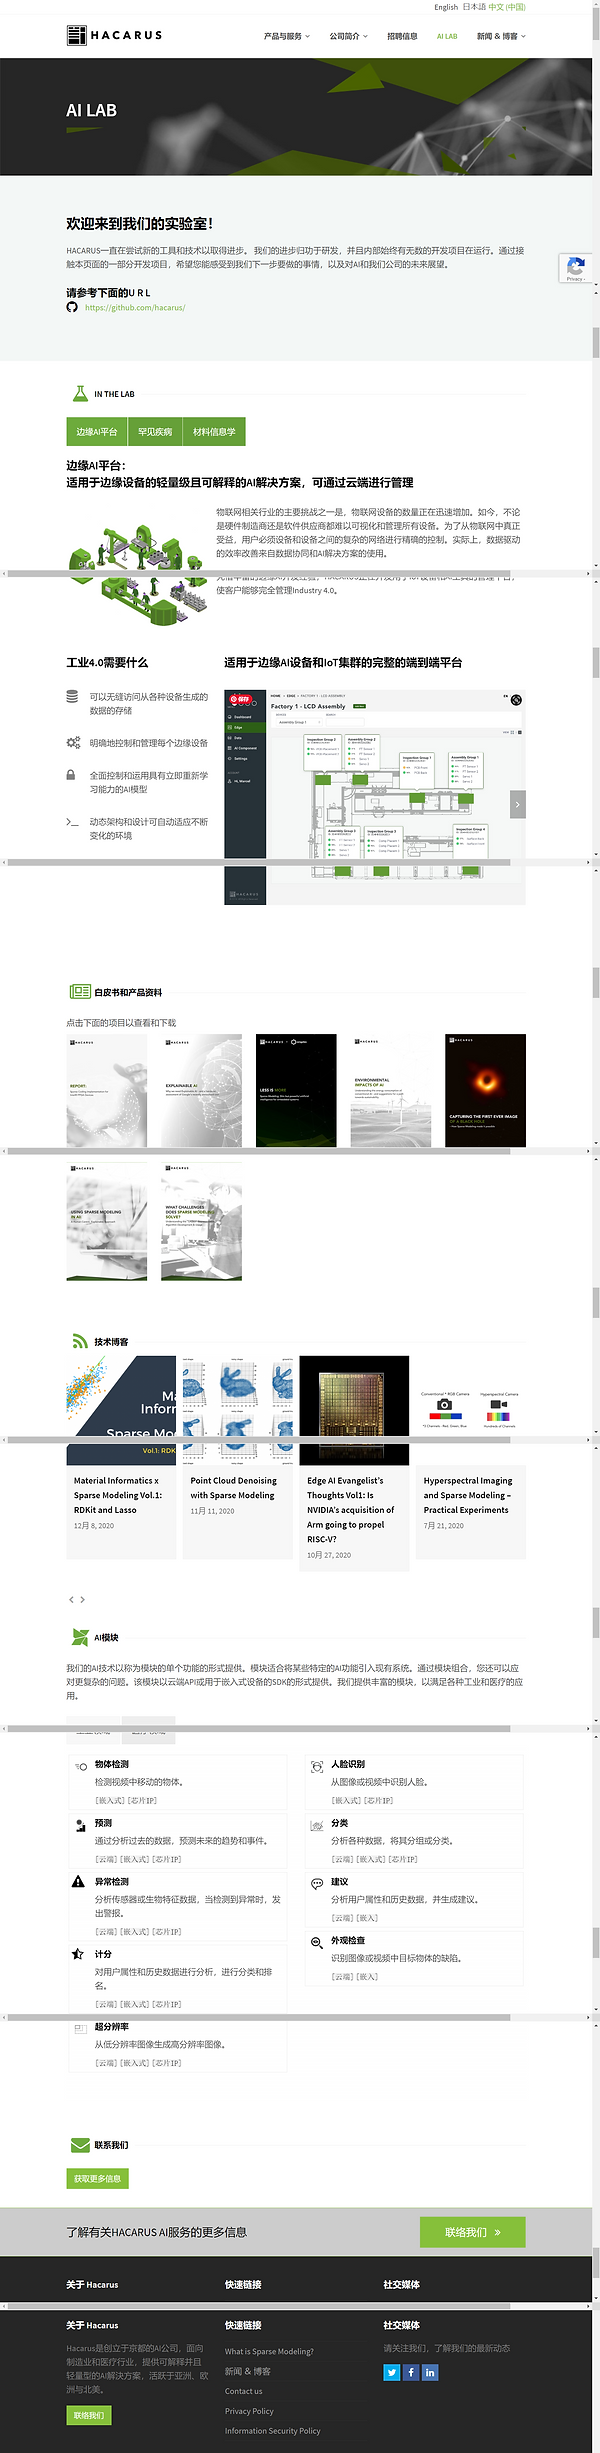 Screenshot - 2020-12-29T153313.137.png